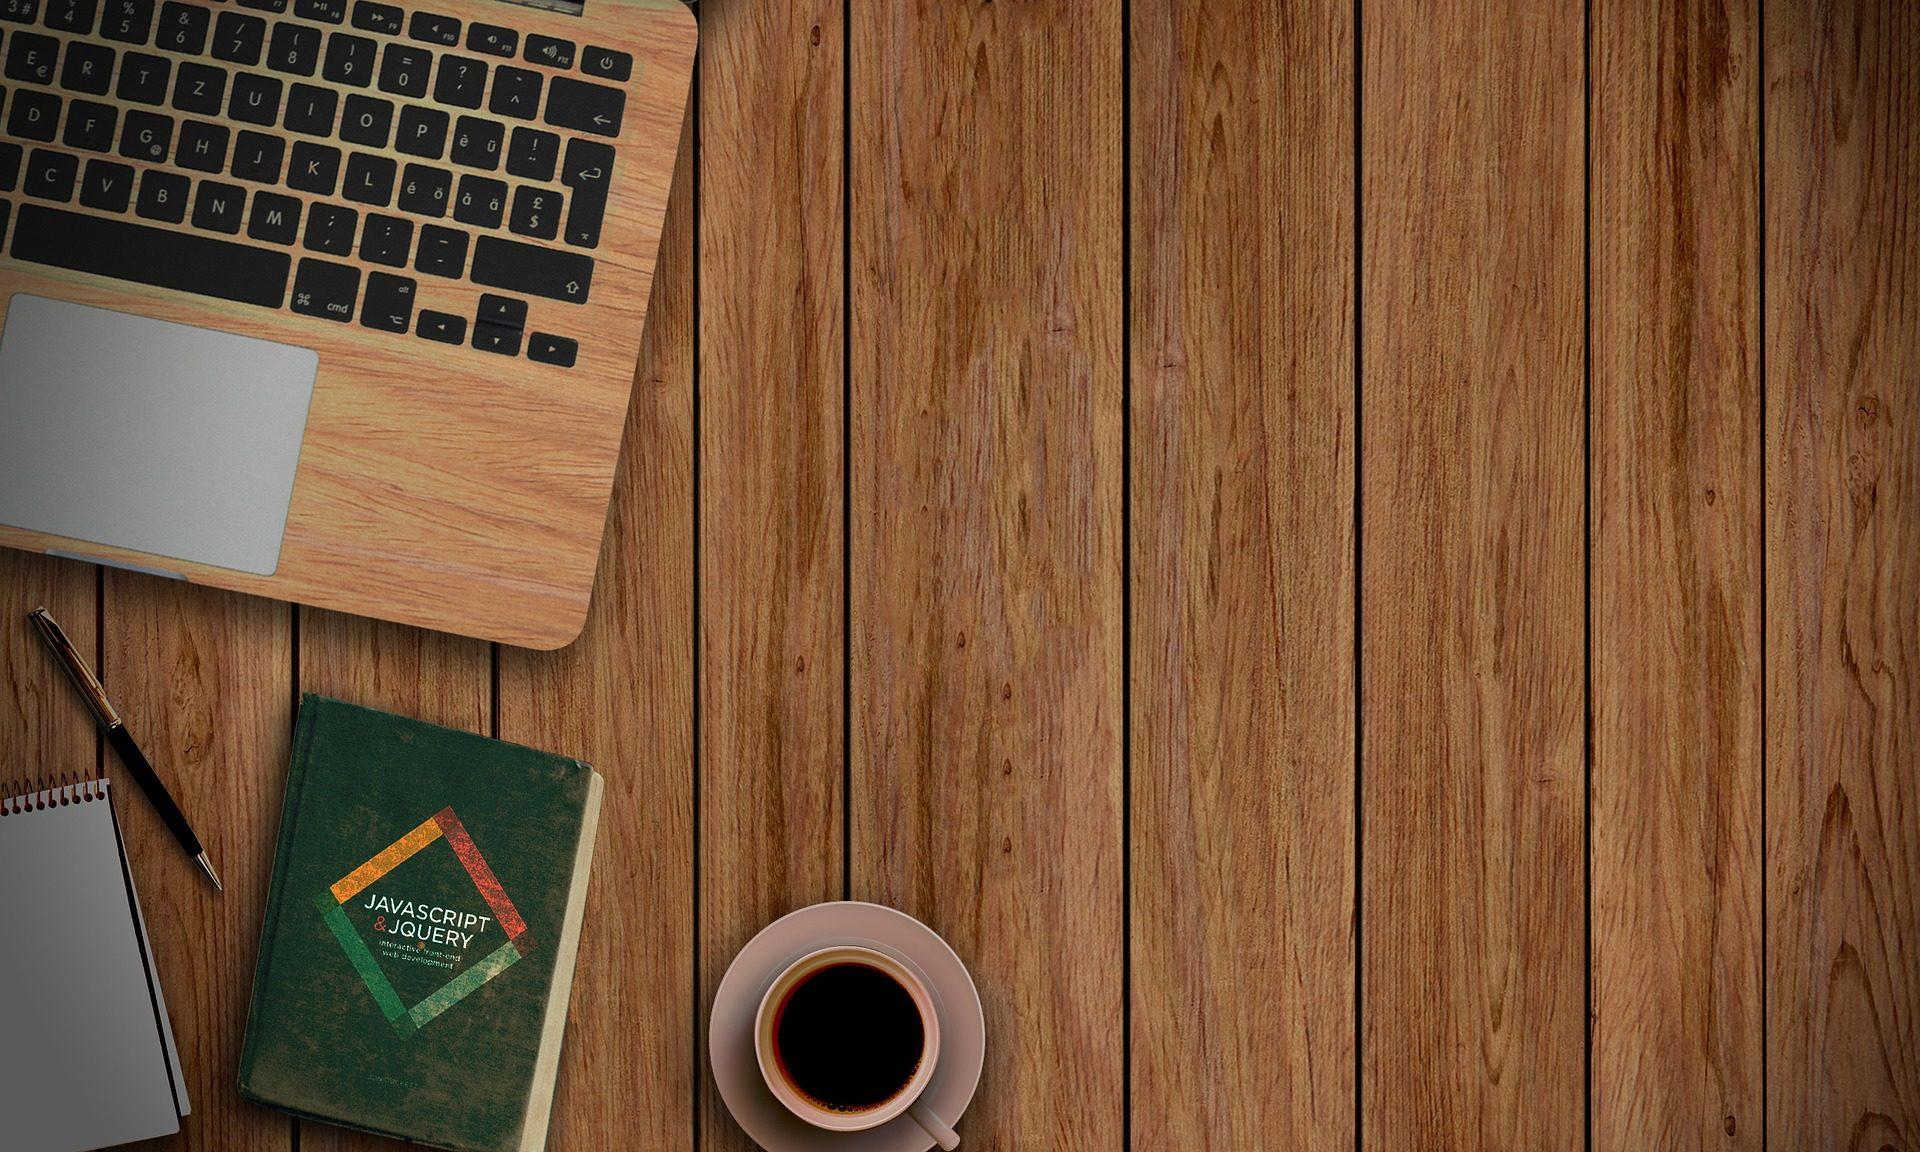 diseño web - hubdigital - blog diseño web